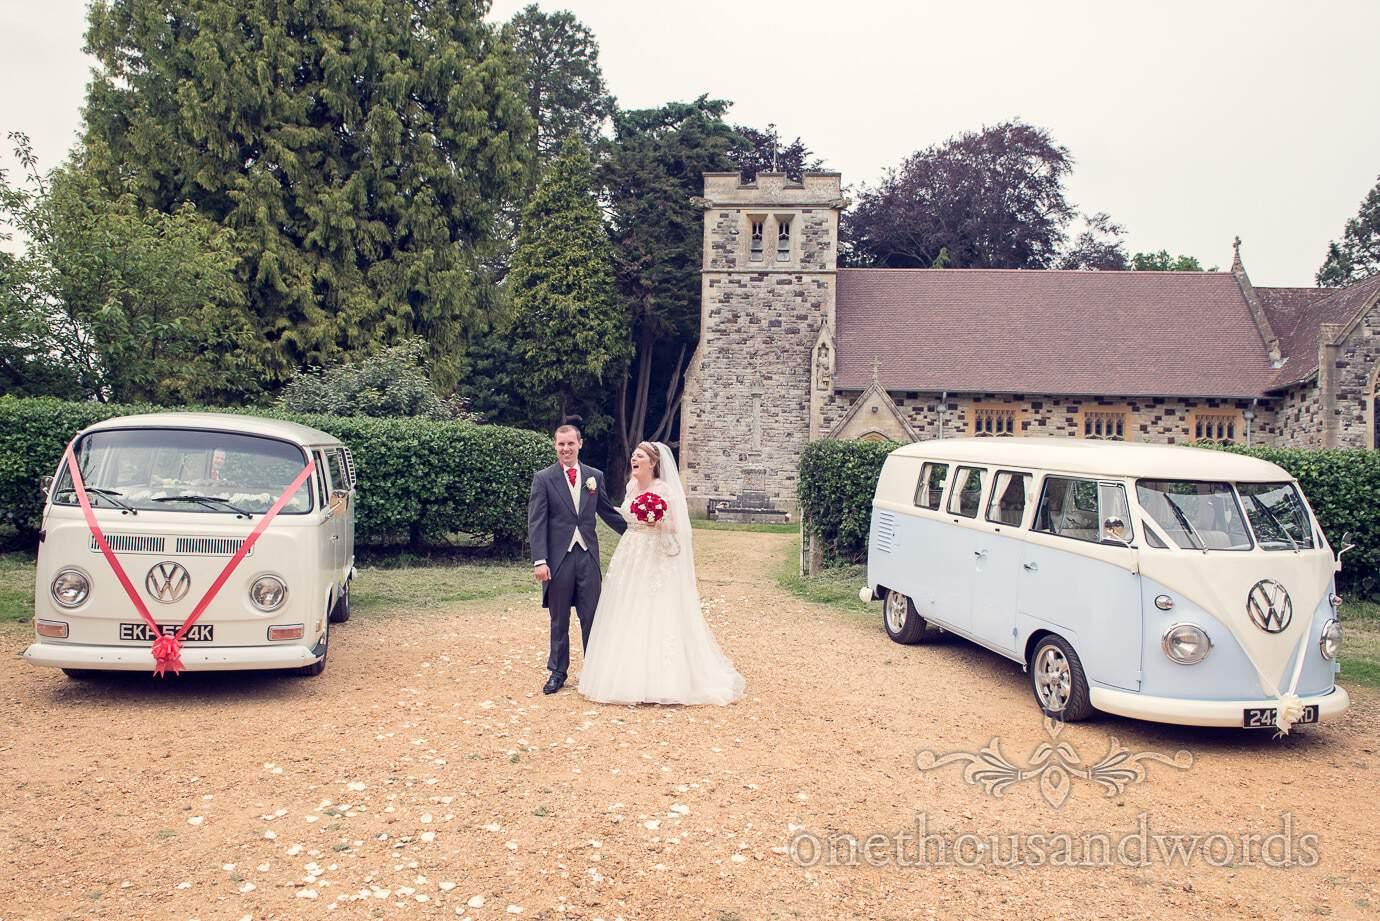 VW wedding camper vans from Dorset Dub Hire outside Church wedding in Dorset